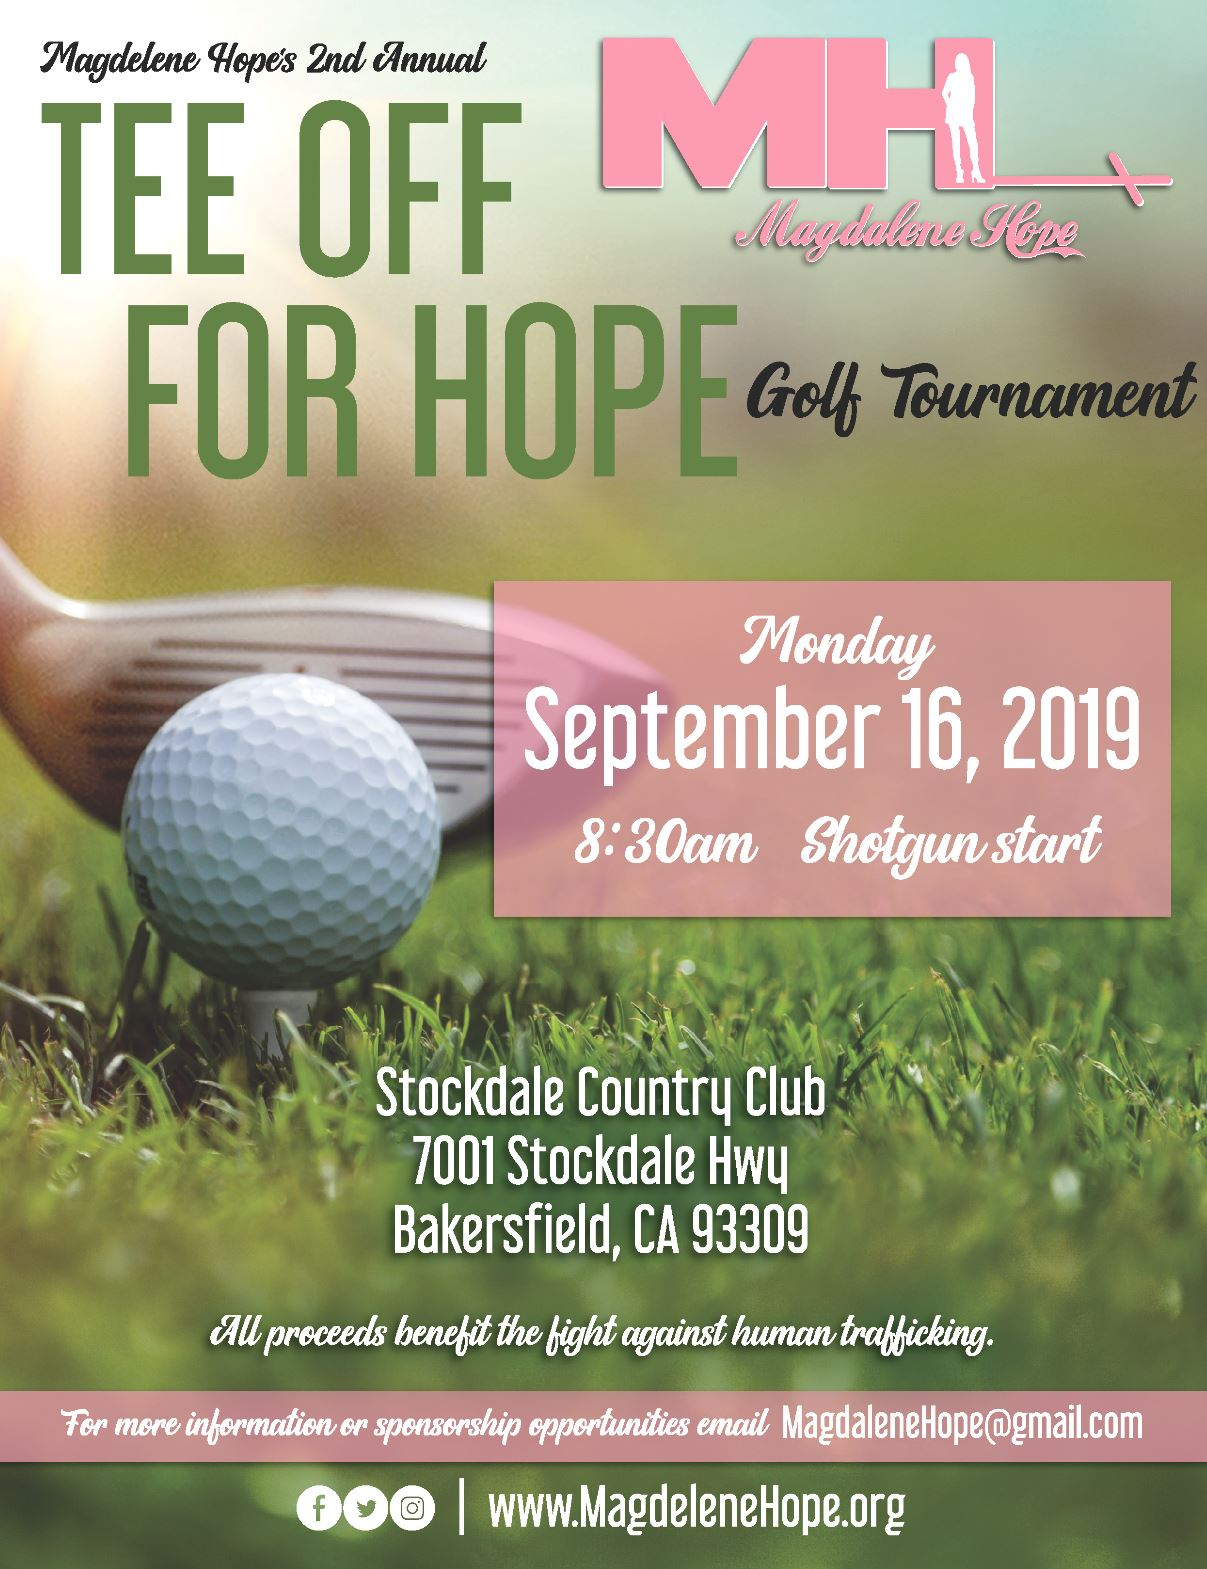 2019 Magdalene Hope Tee Off For Hope Golf Tournament